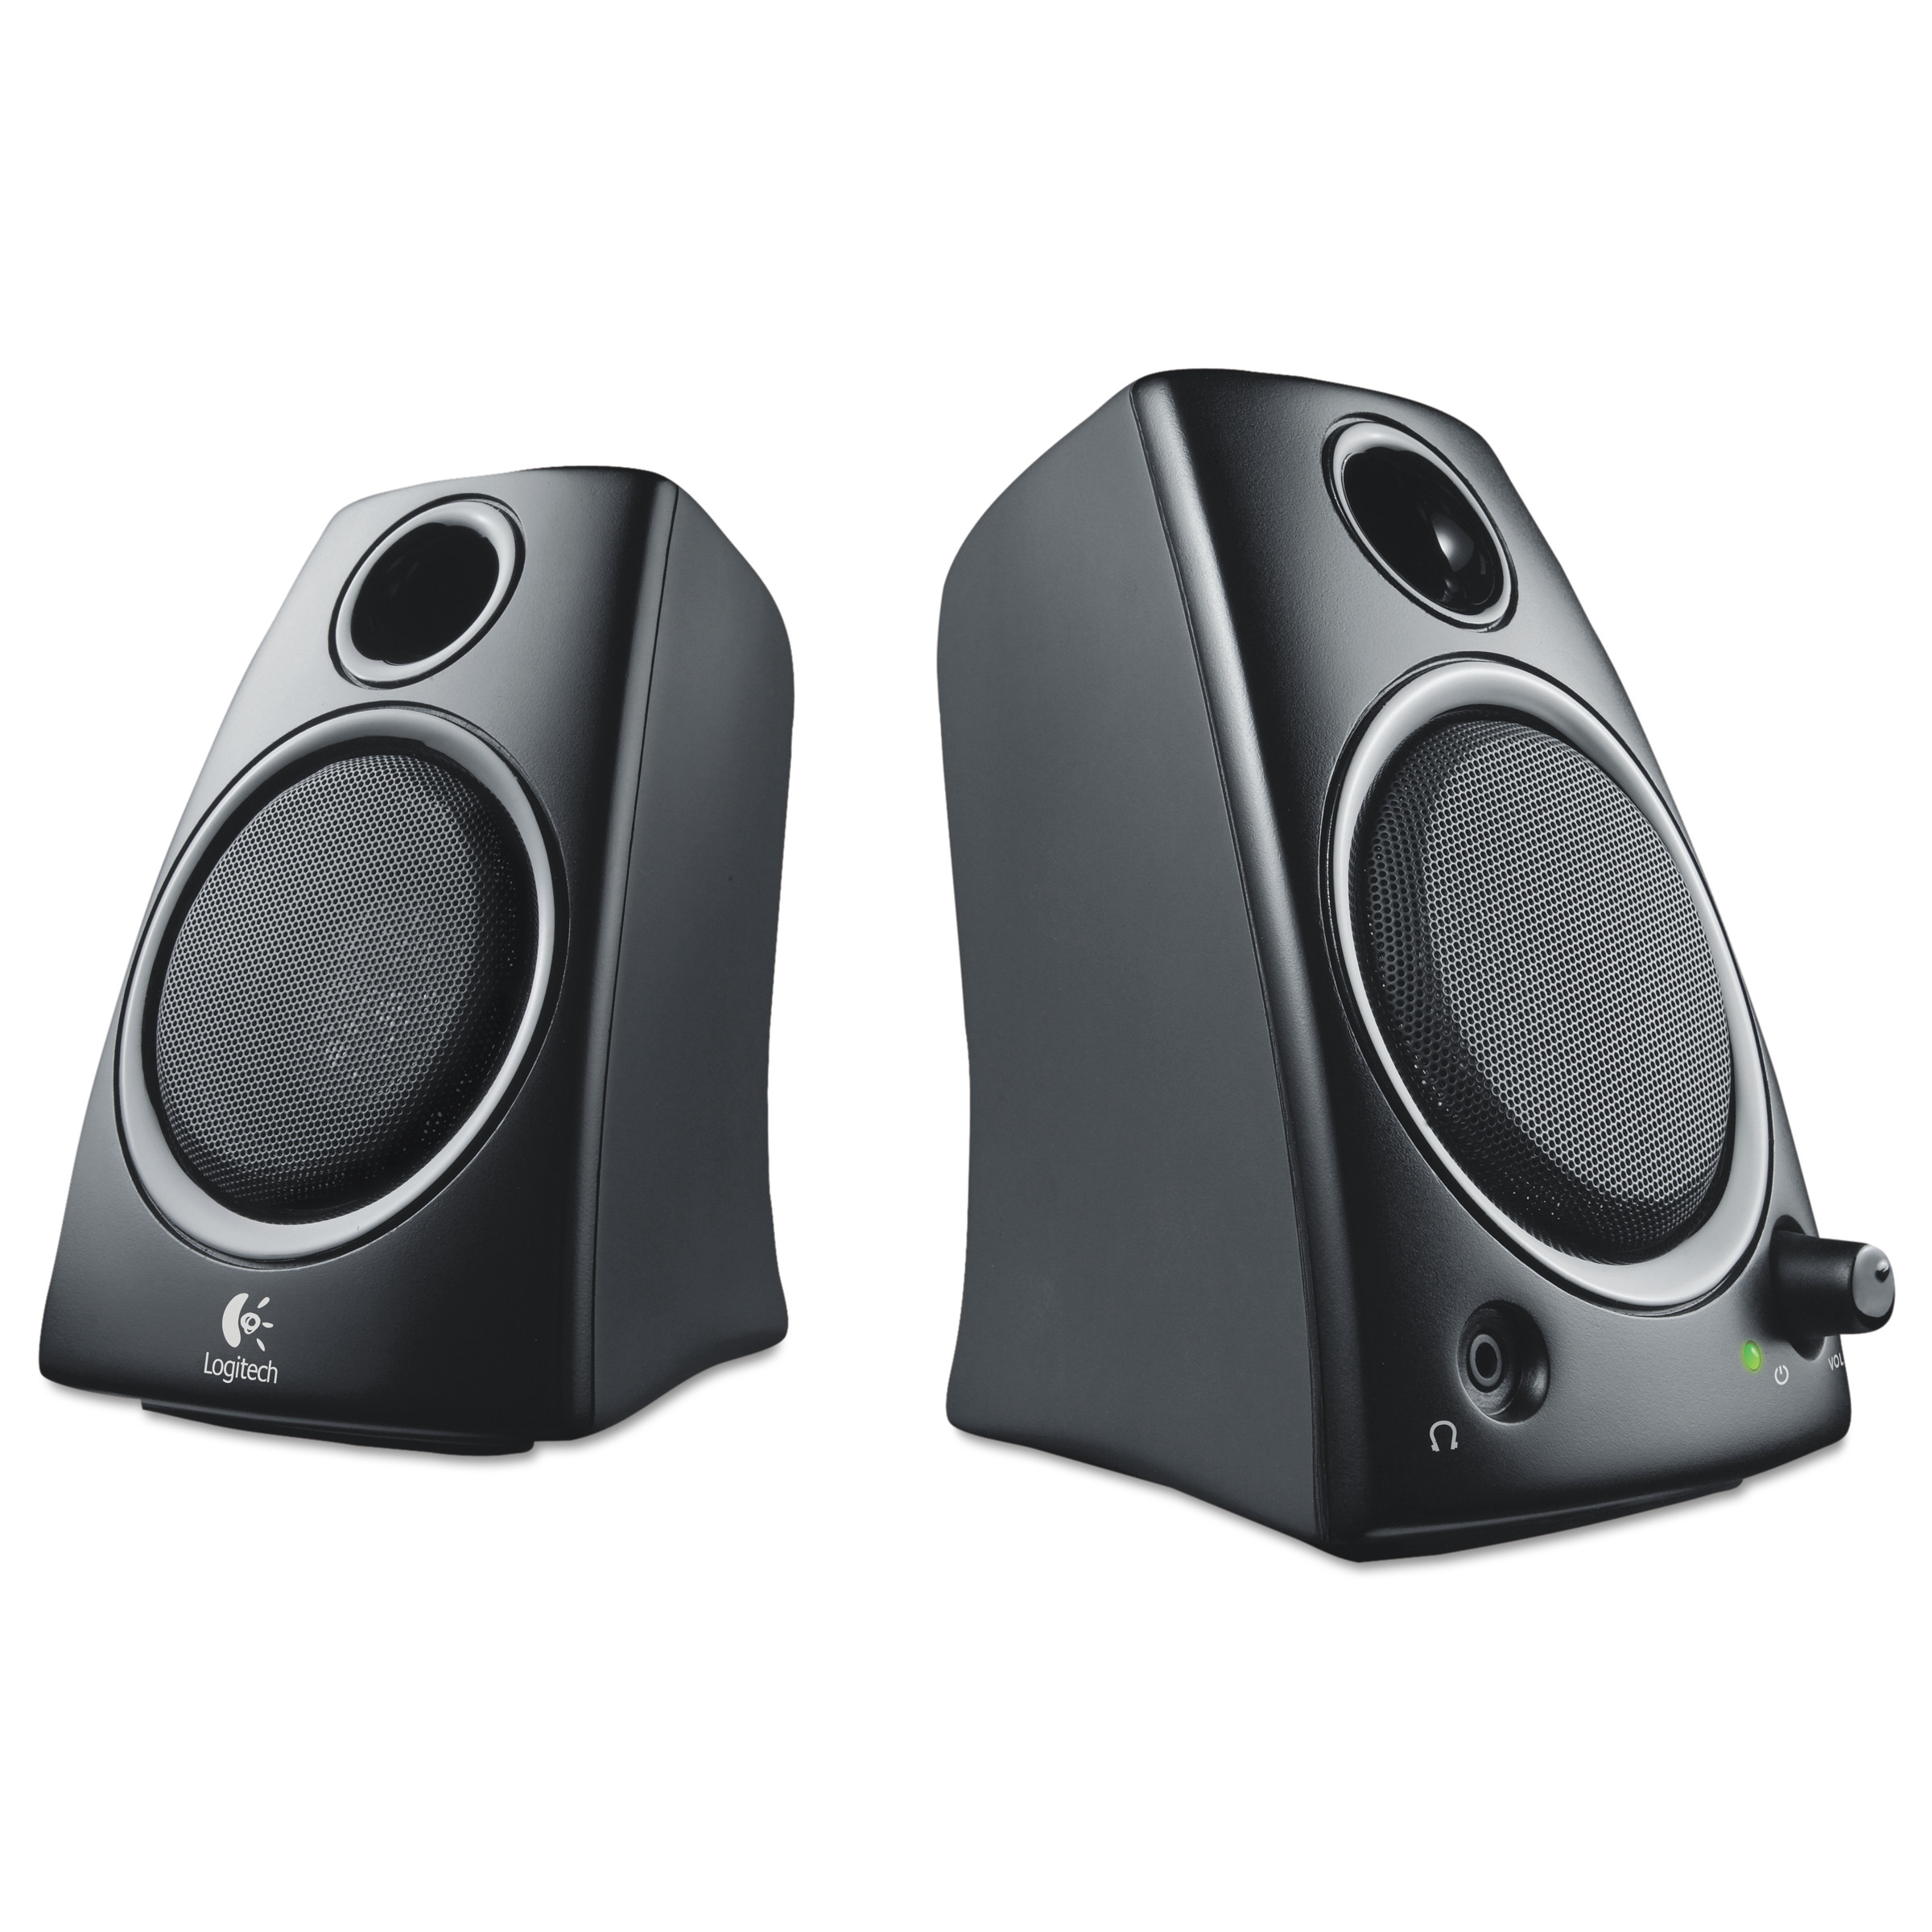 Logitech Z130 Compact 2 0 Stereo Speakers, 3 5mm Jack, Black